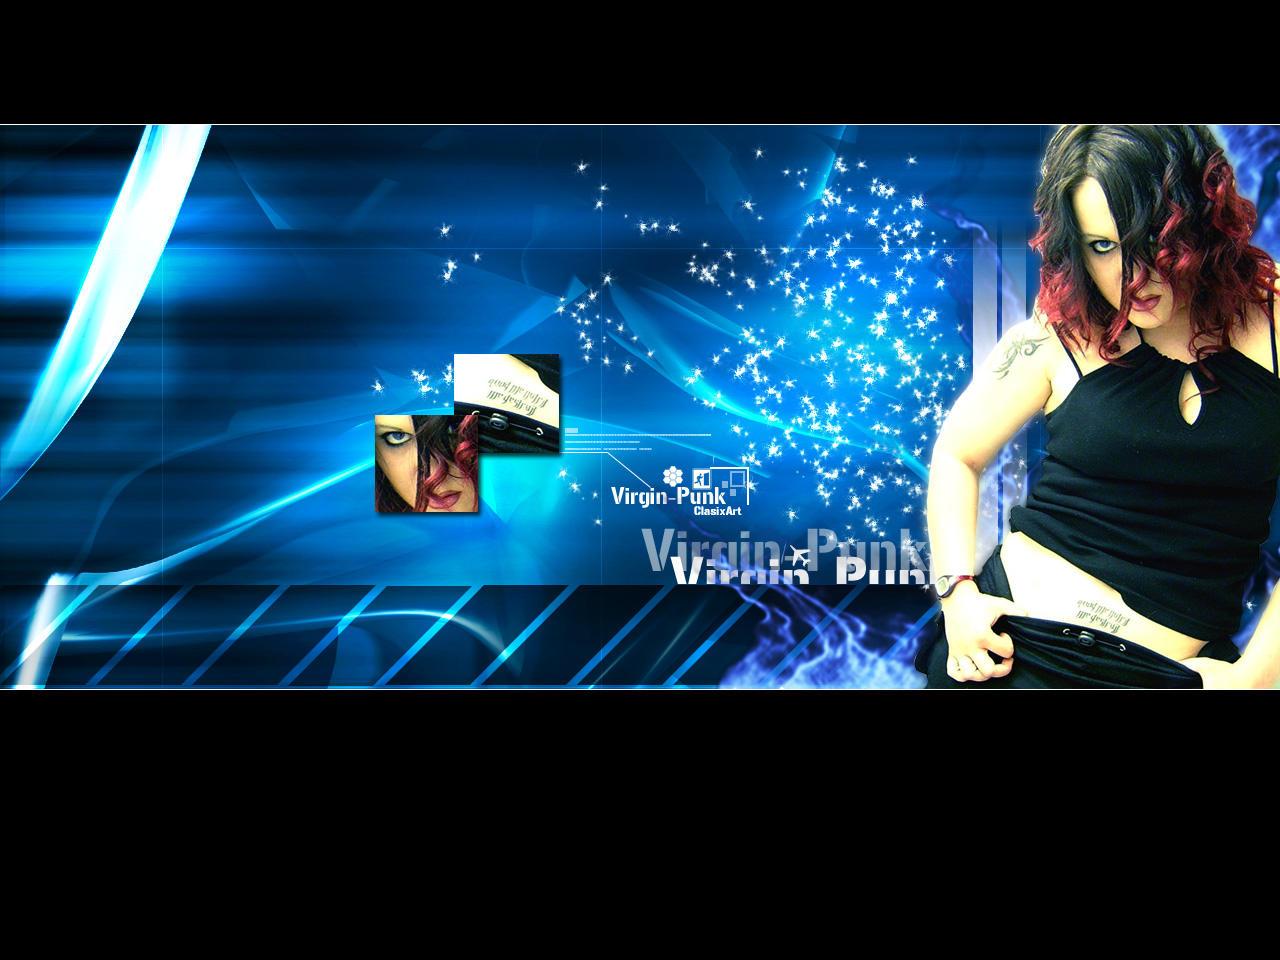 Virgin-Punk In Blue by clasixart